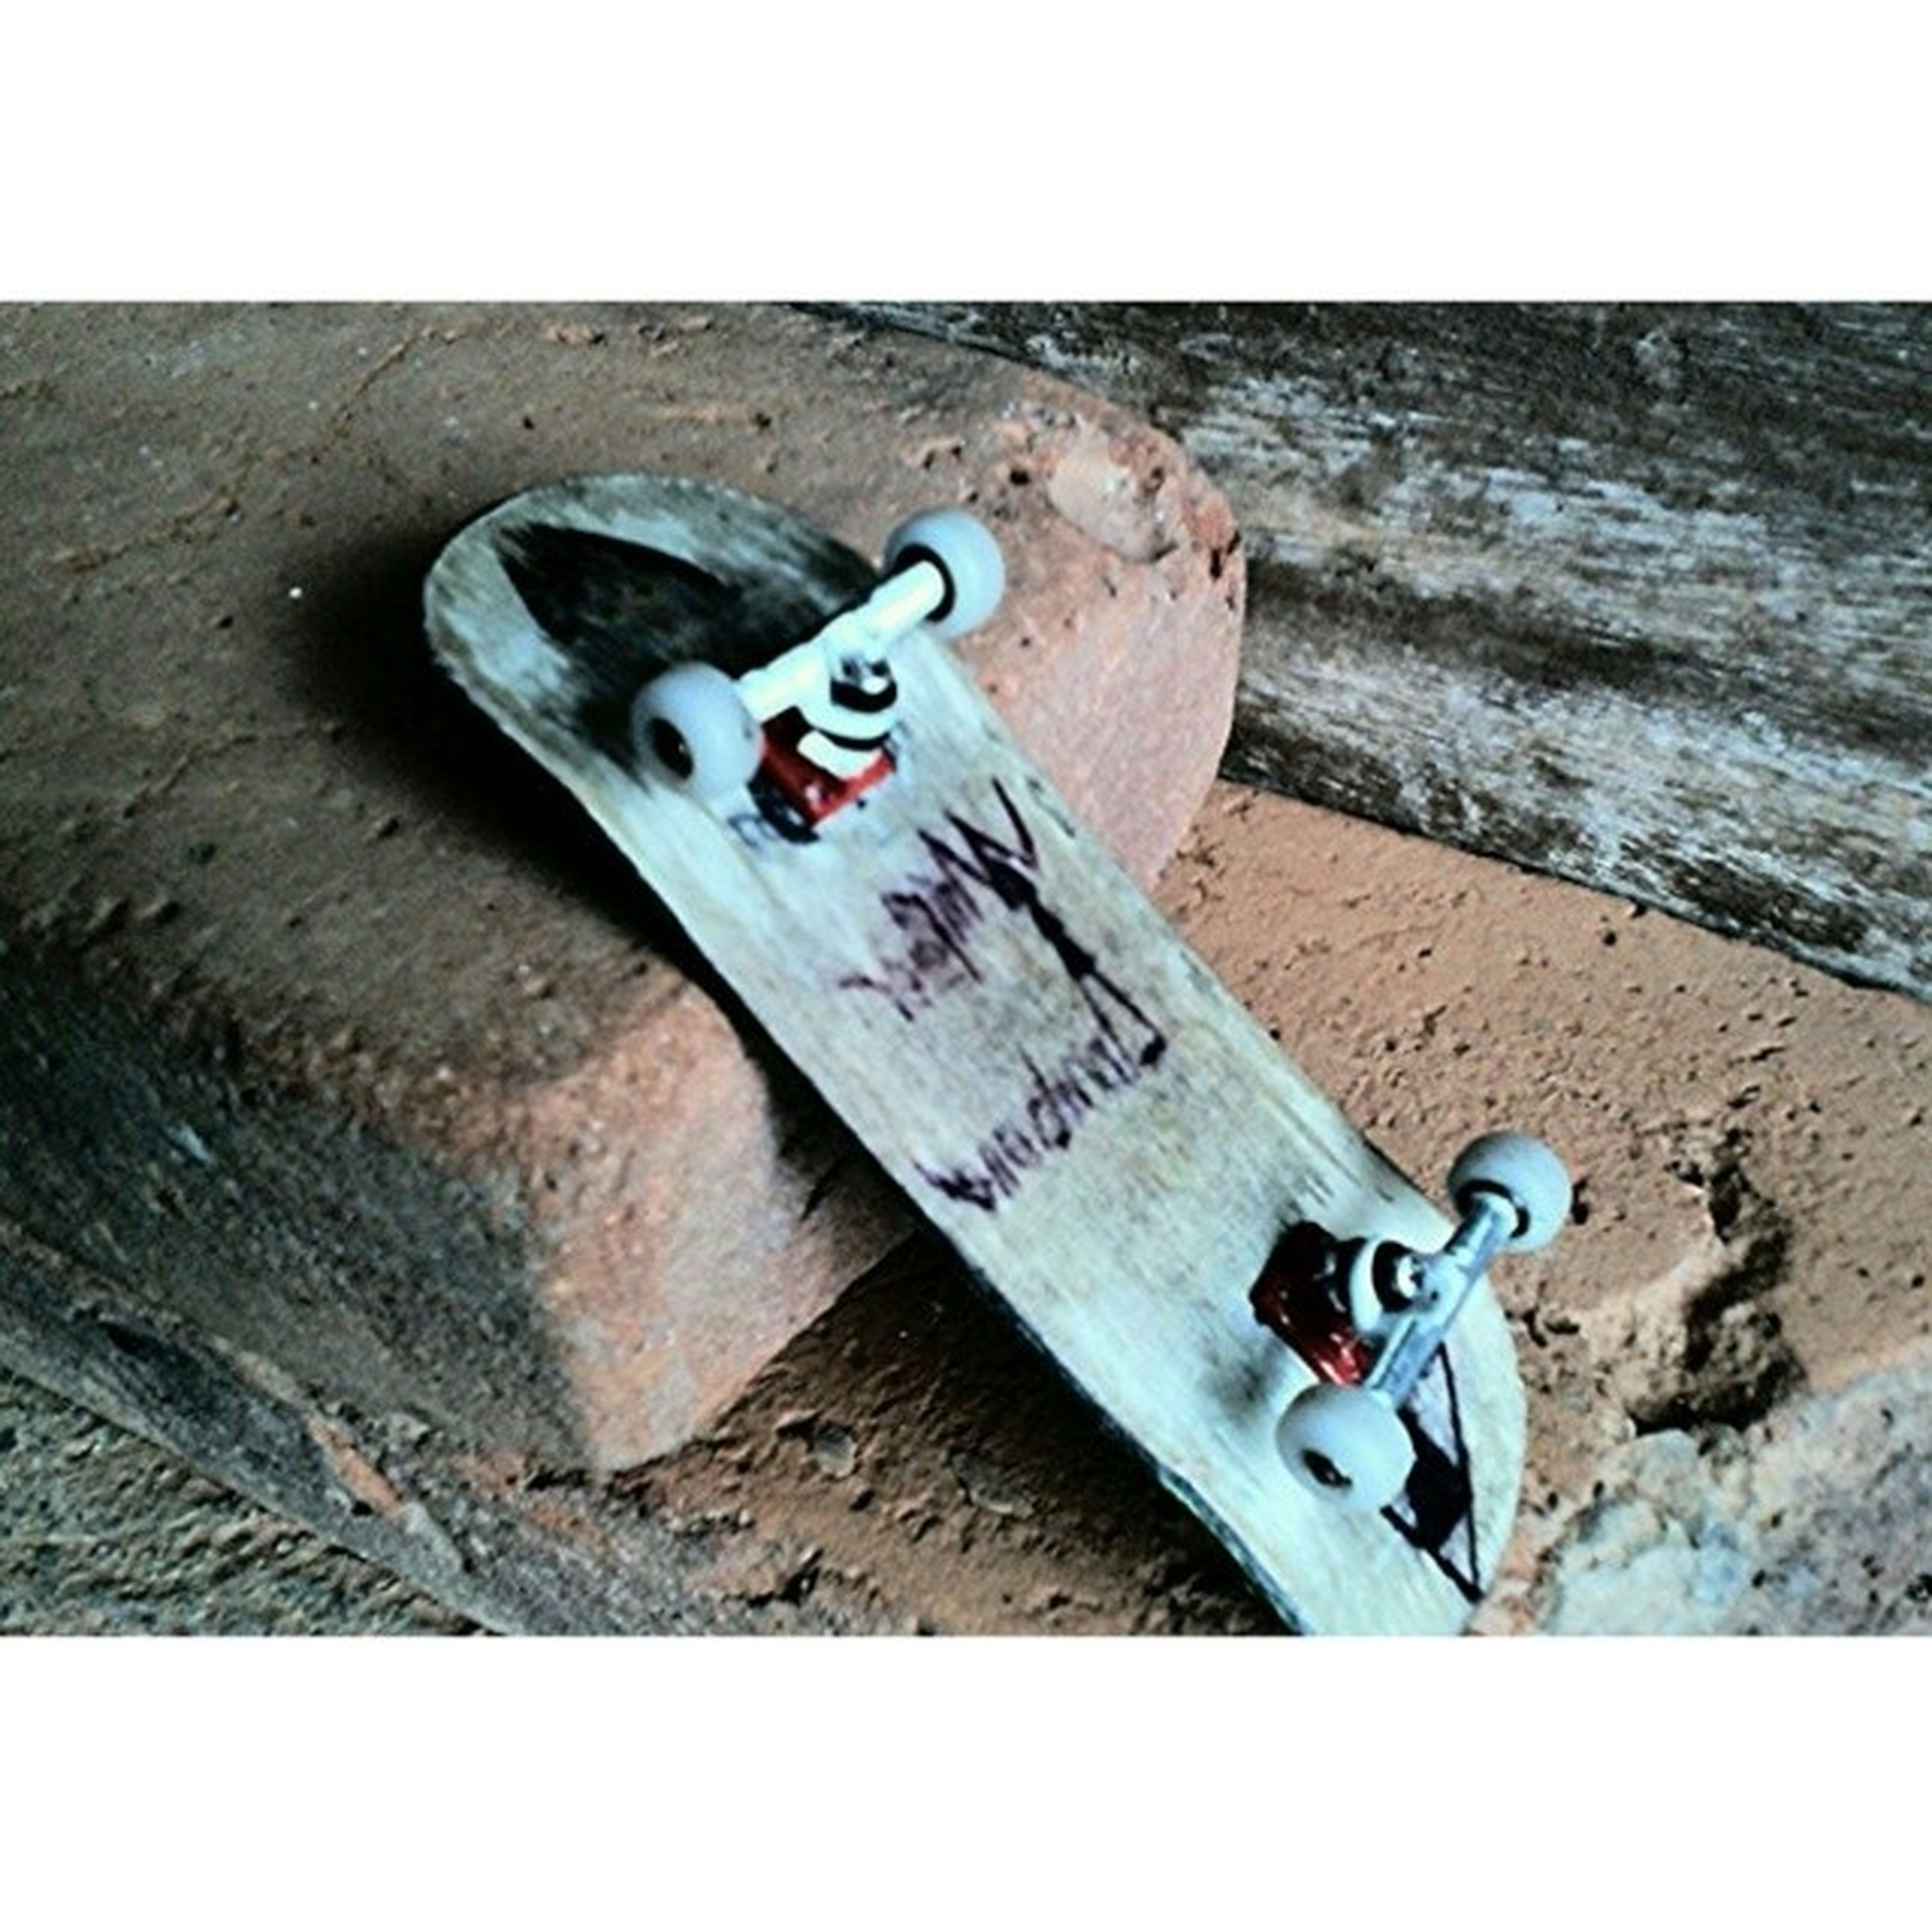 Myfingerboard Woodlipsfingerboard Planktoonfingerboard Trucksrebithoneplanktoonfingerboard whelslasereditionplanktoonfingerboardacehkeepenjoyfingerboardsalam2jari